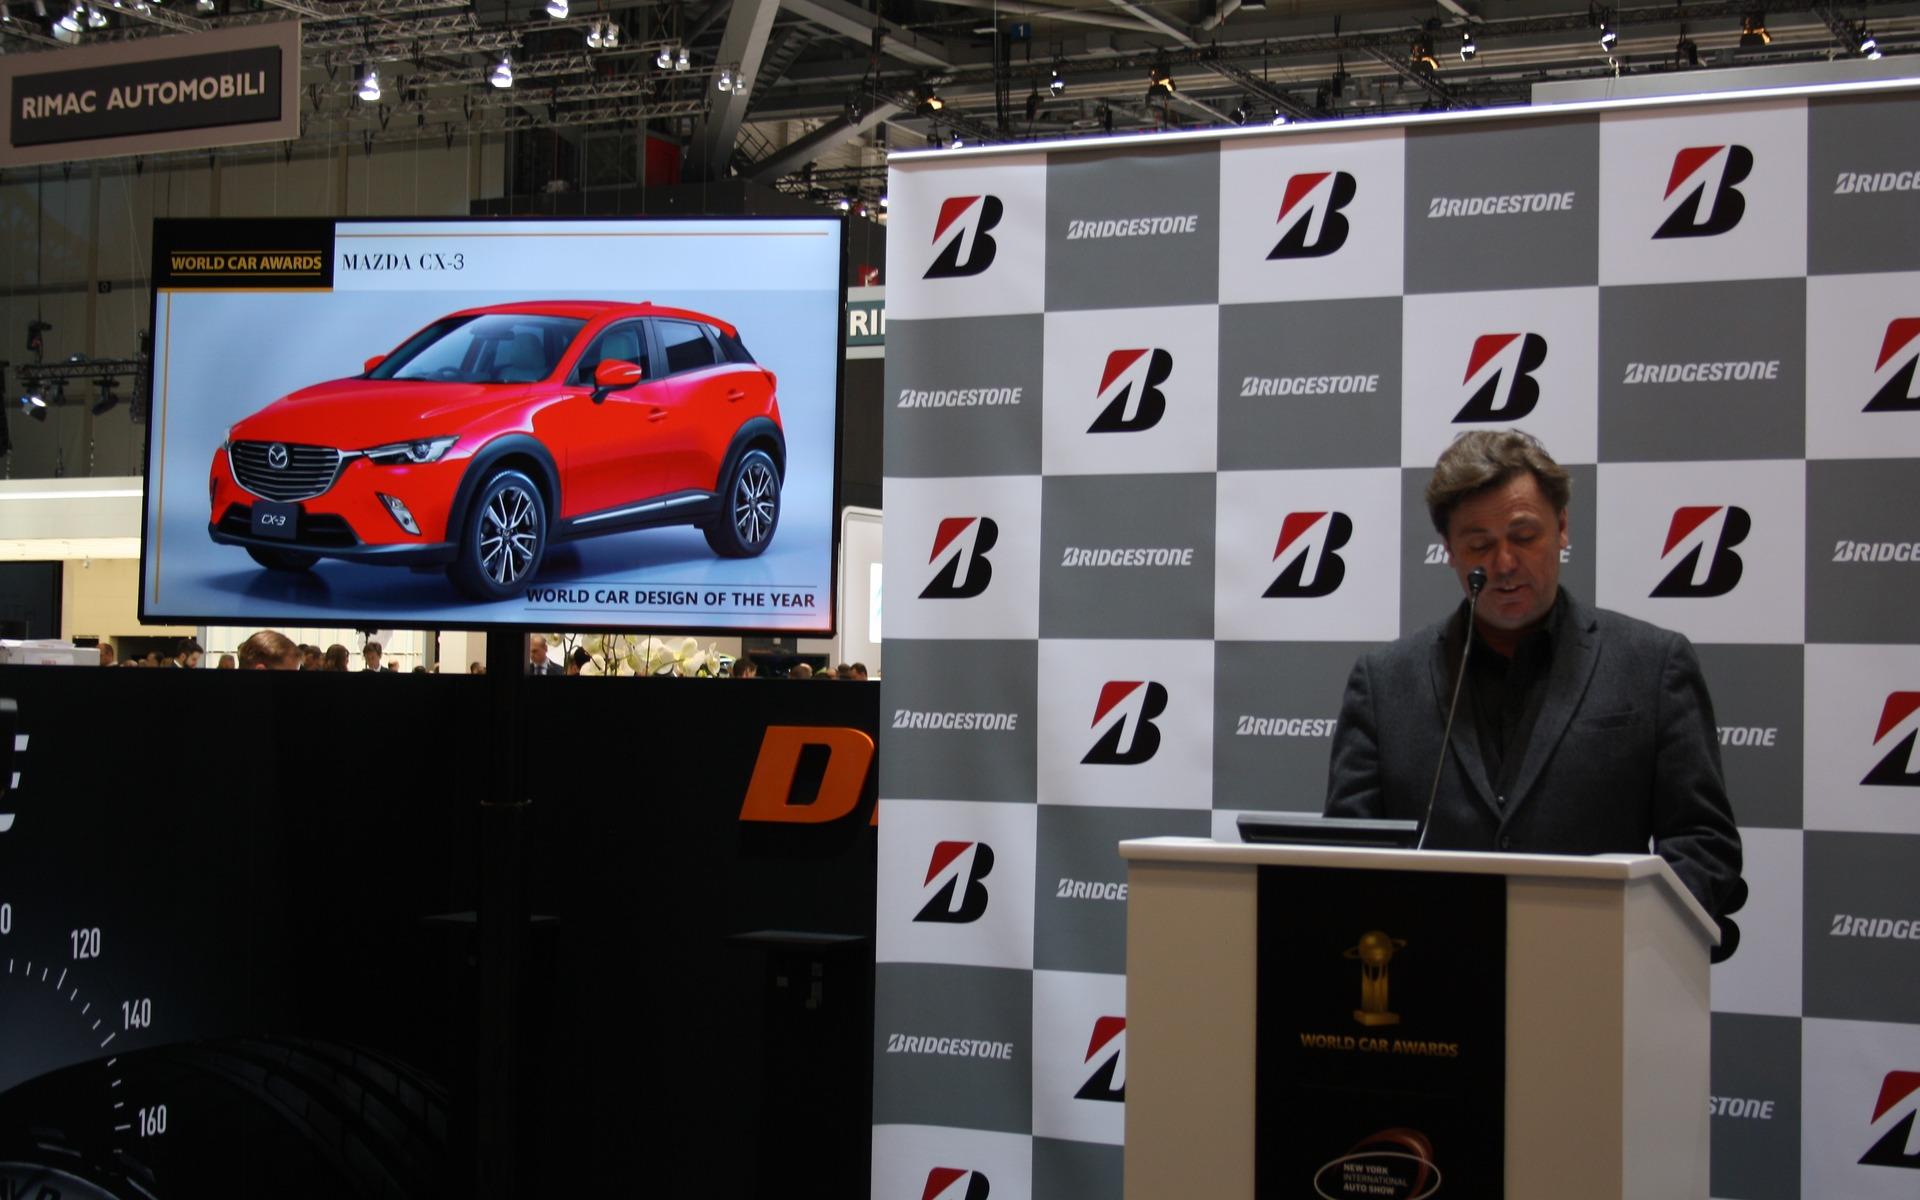 2016 World Car Design of the Year finalist: Mazda CX-3